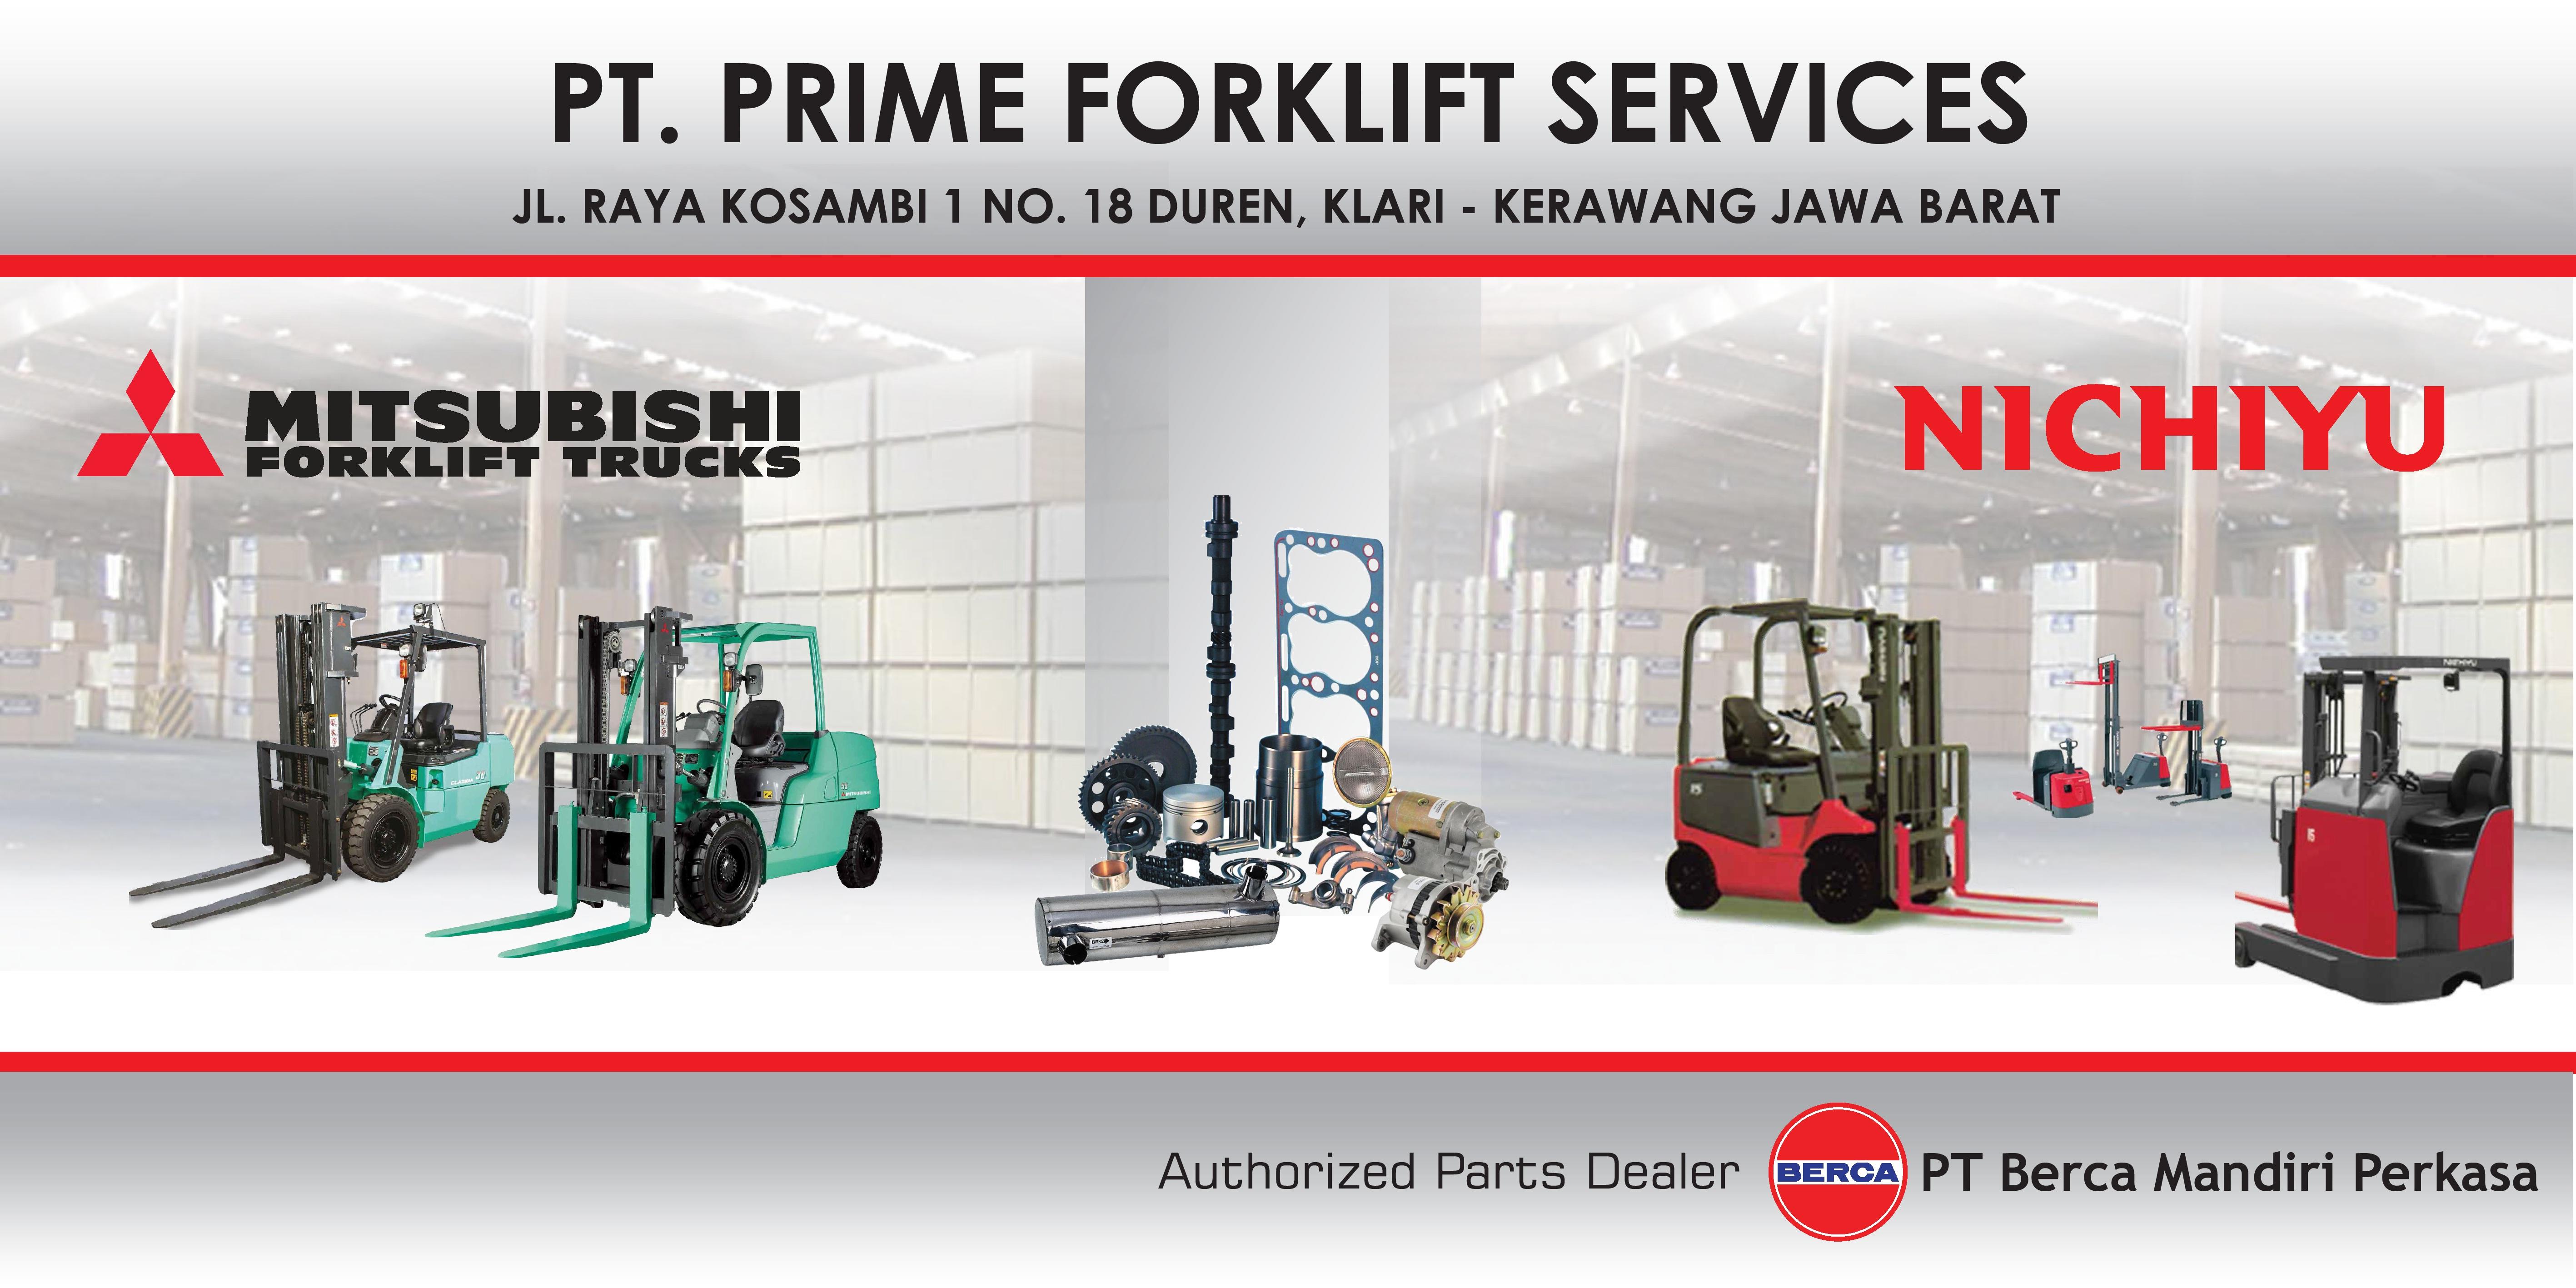 Sewa Forklift wilayah bekasi, cibitung, cikarang, karawang, cikampek dan purwakarta